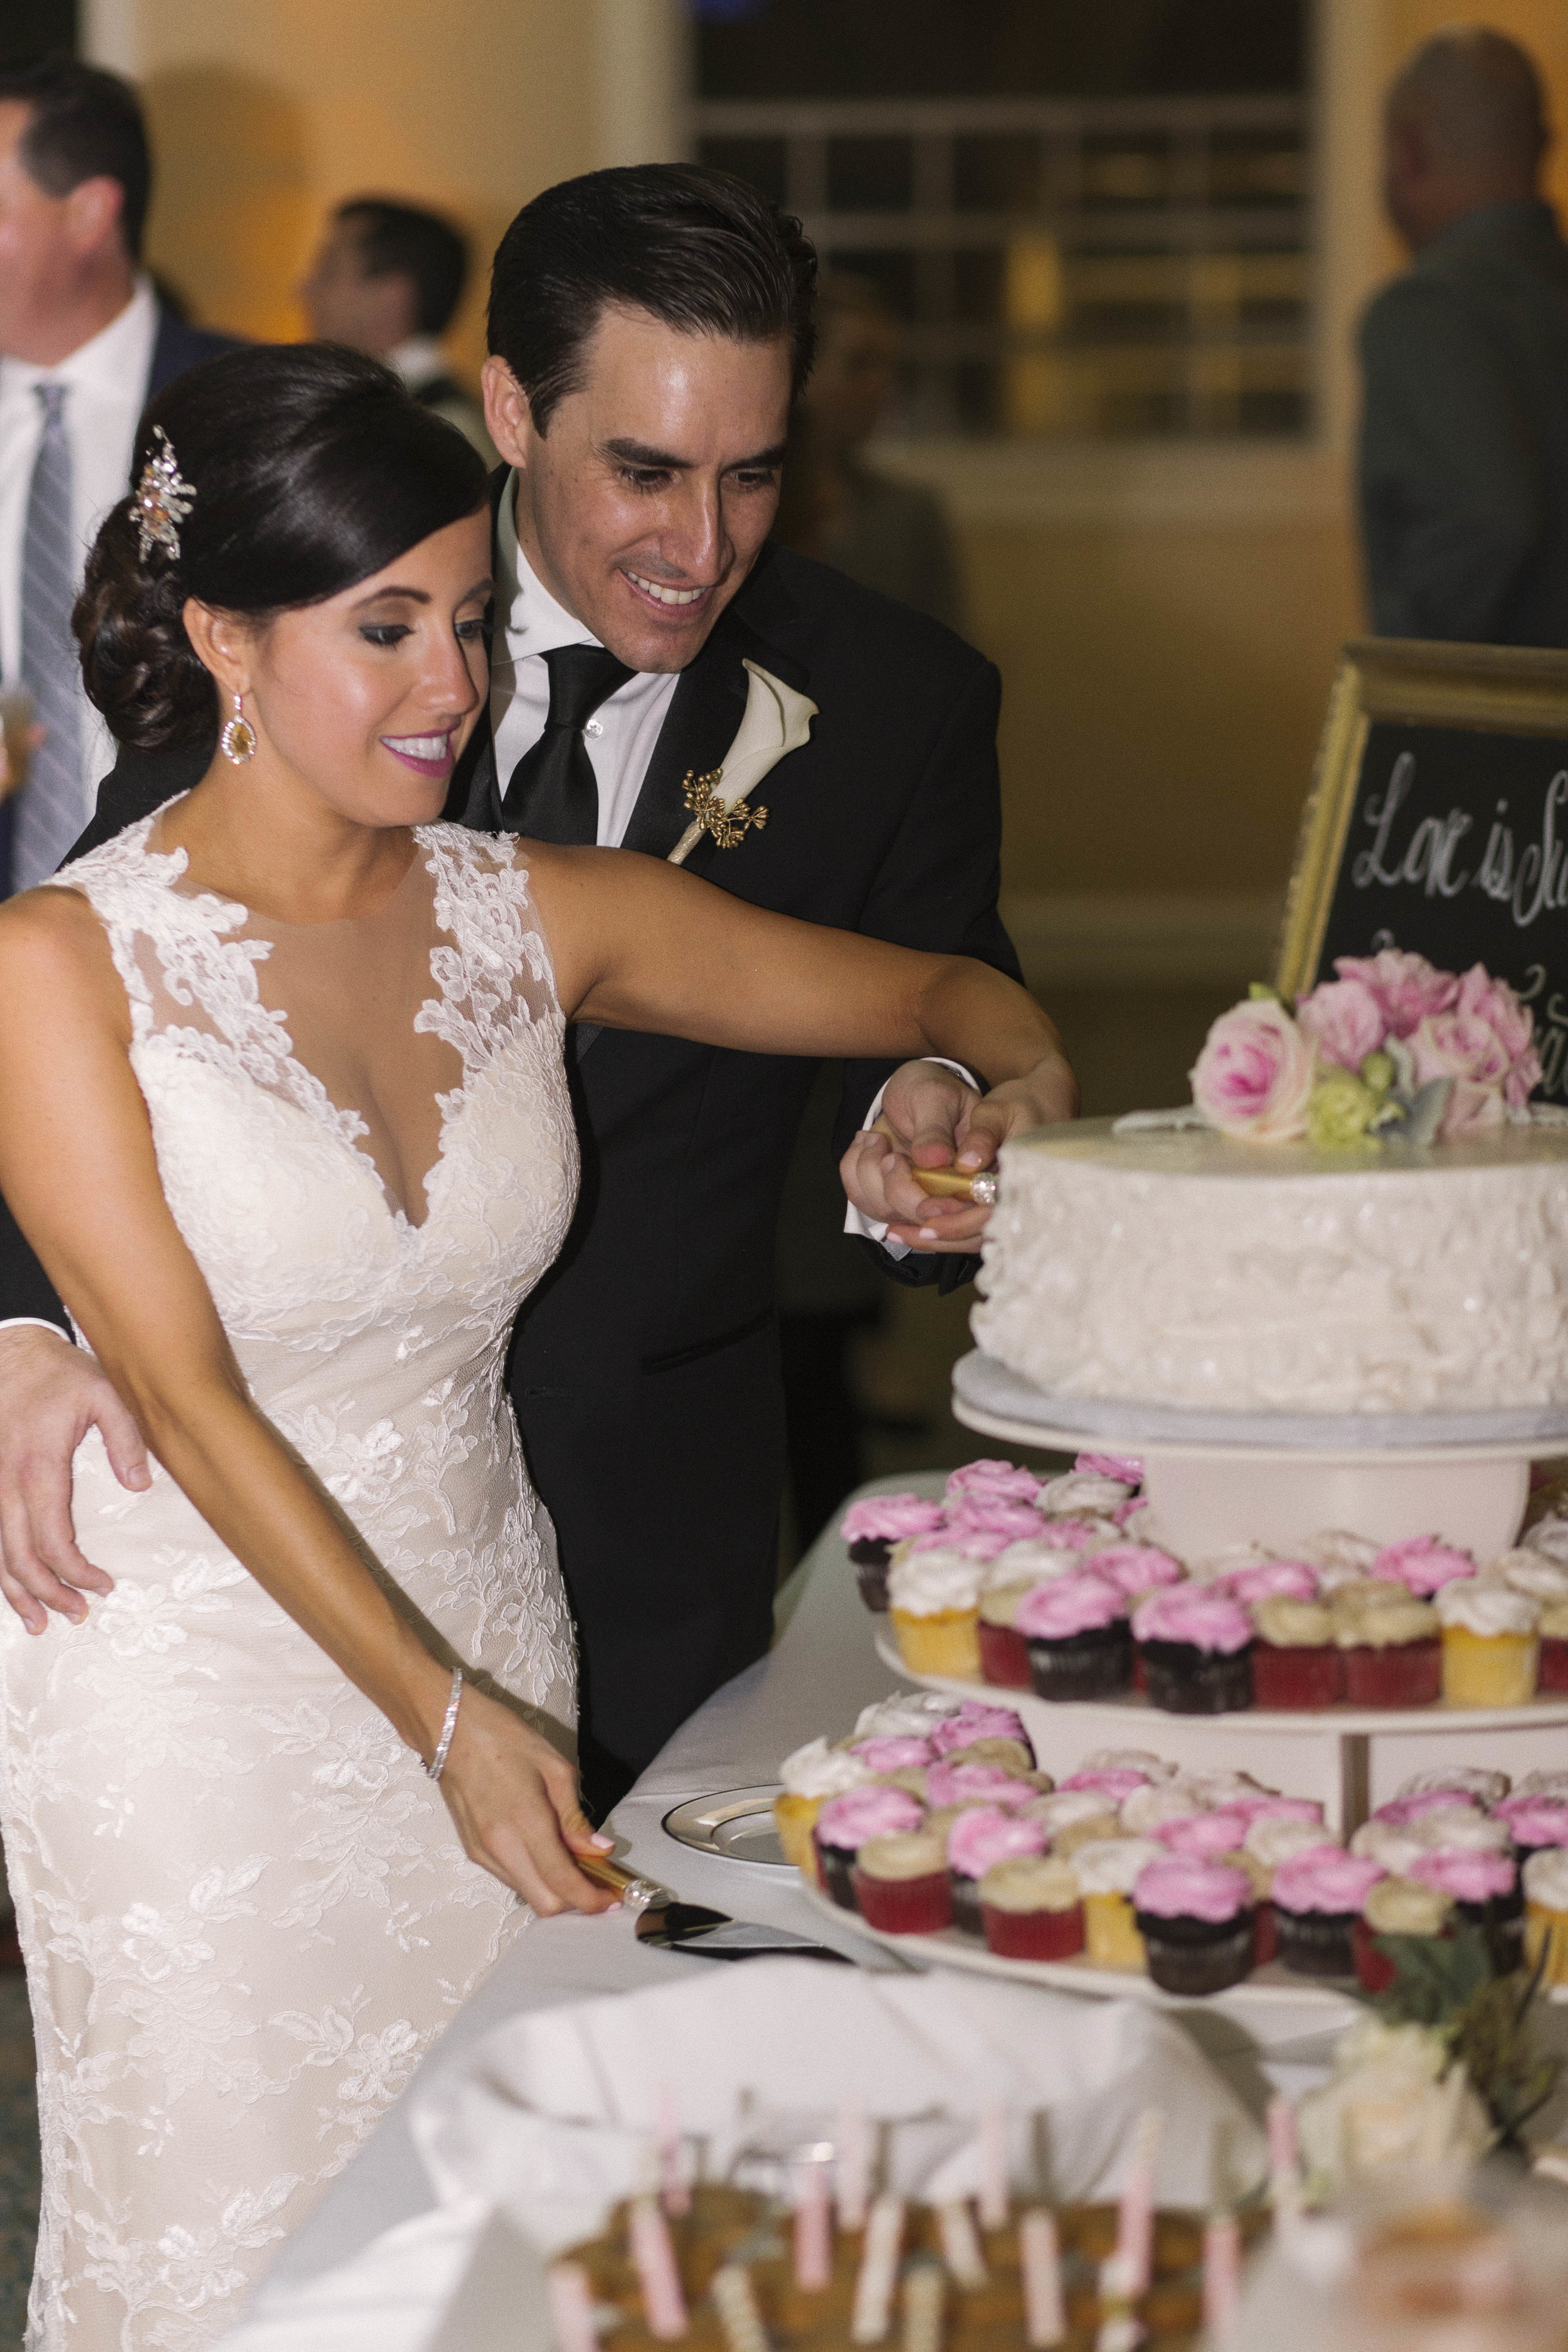 winsor event studio wedding cake cutting